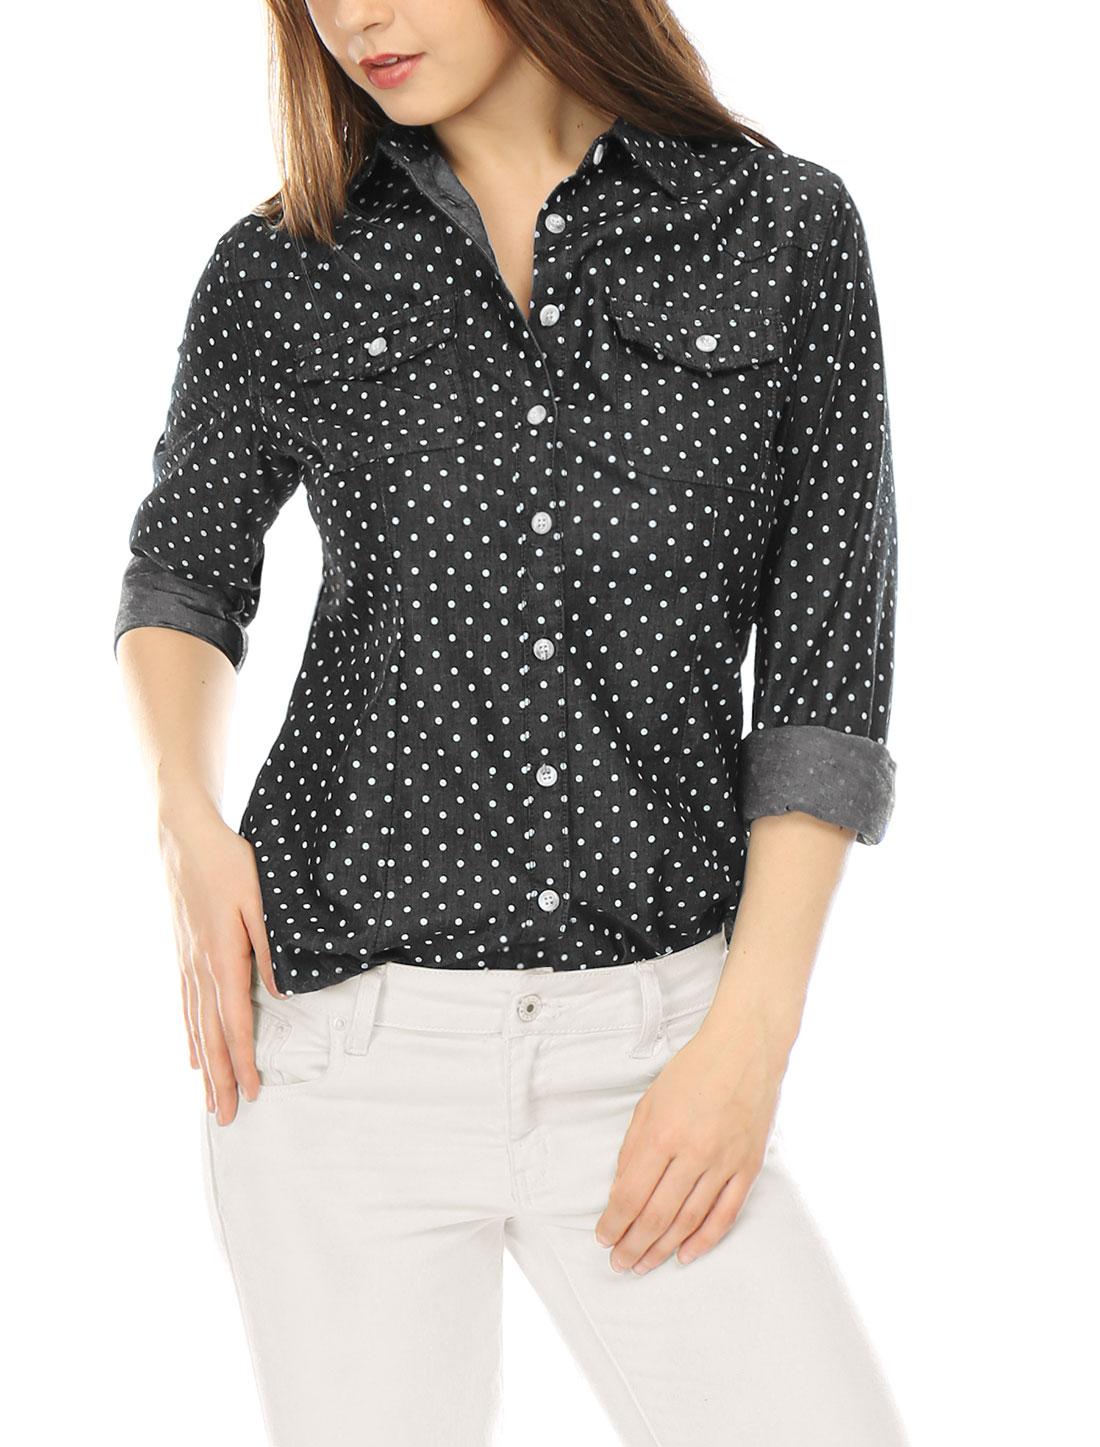 Allegra K Women Dots Point Collar Chest Pockets Button Down Shirt Black L